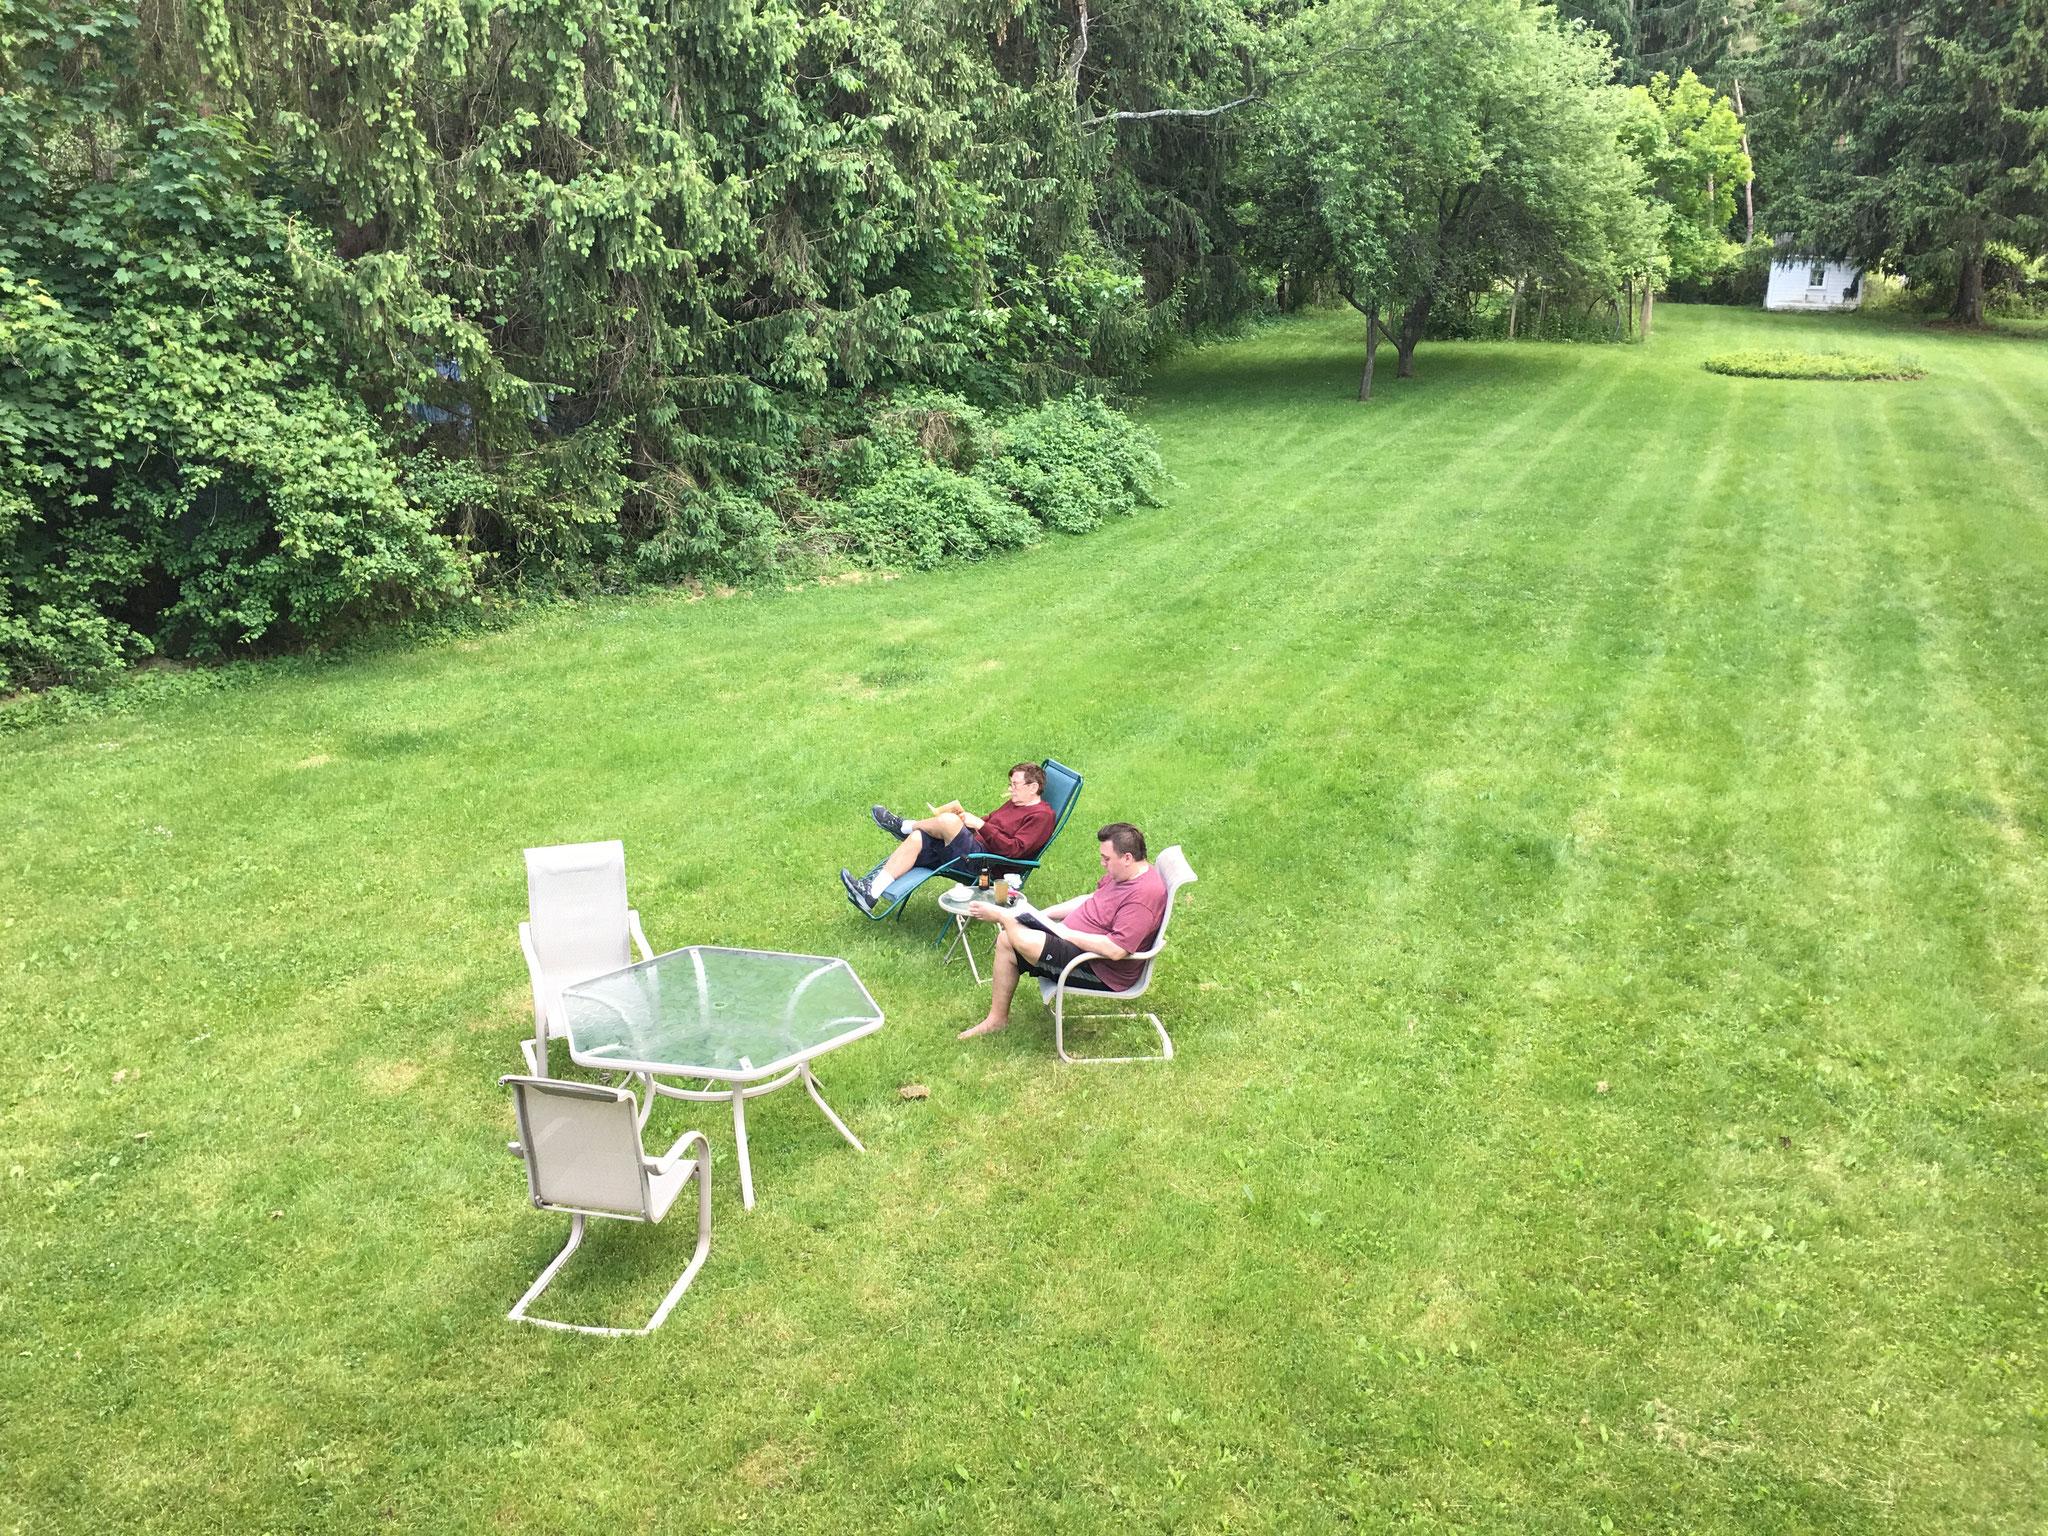 Greg & John enjoy the backyard at Lockwood Rd., 7-2020